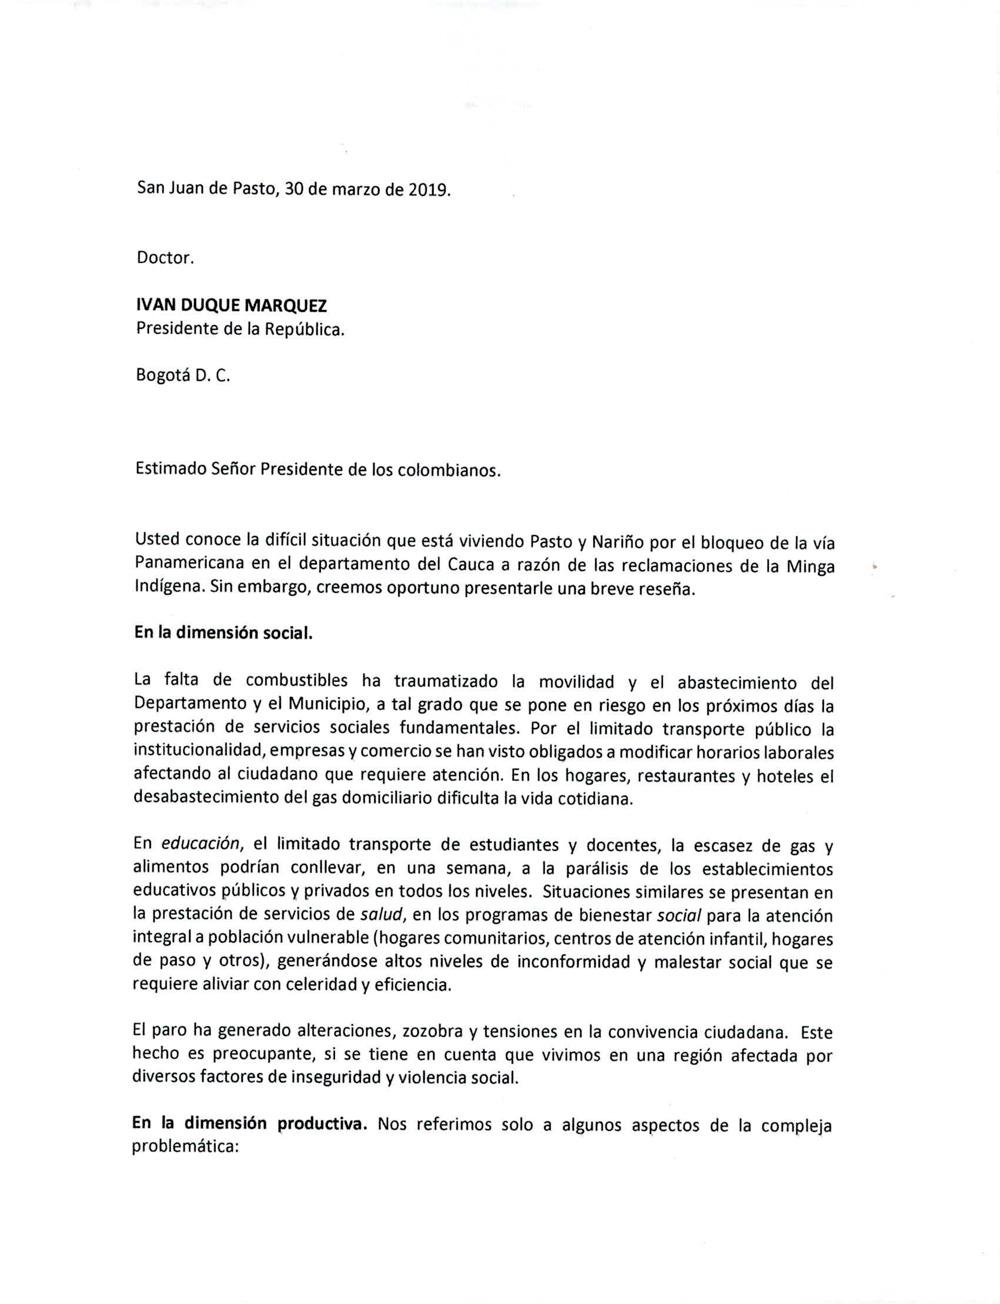 Carta-a-Presidente-Ivan-Duque-1_20934-1-1